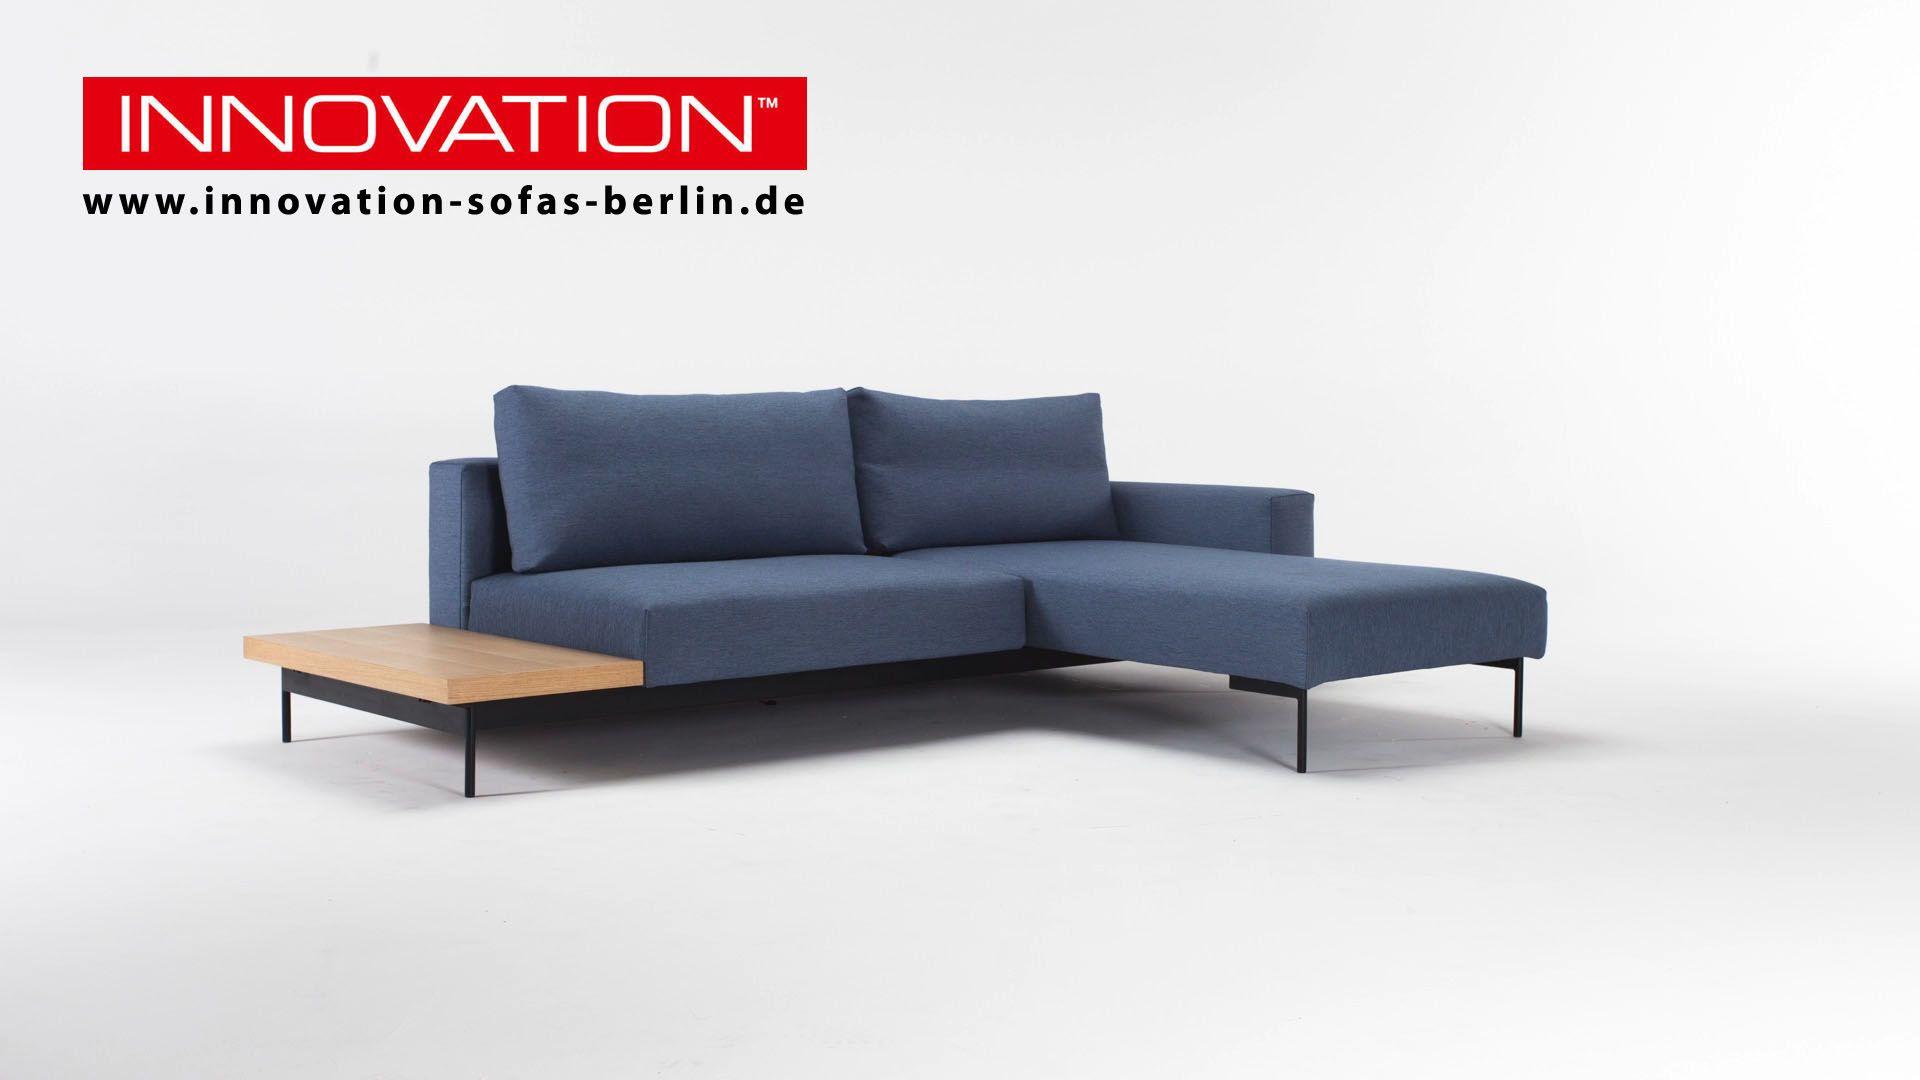 Modulares Schlafsofa Bragi Von Innovation Bei Innovation Sofas Berlin